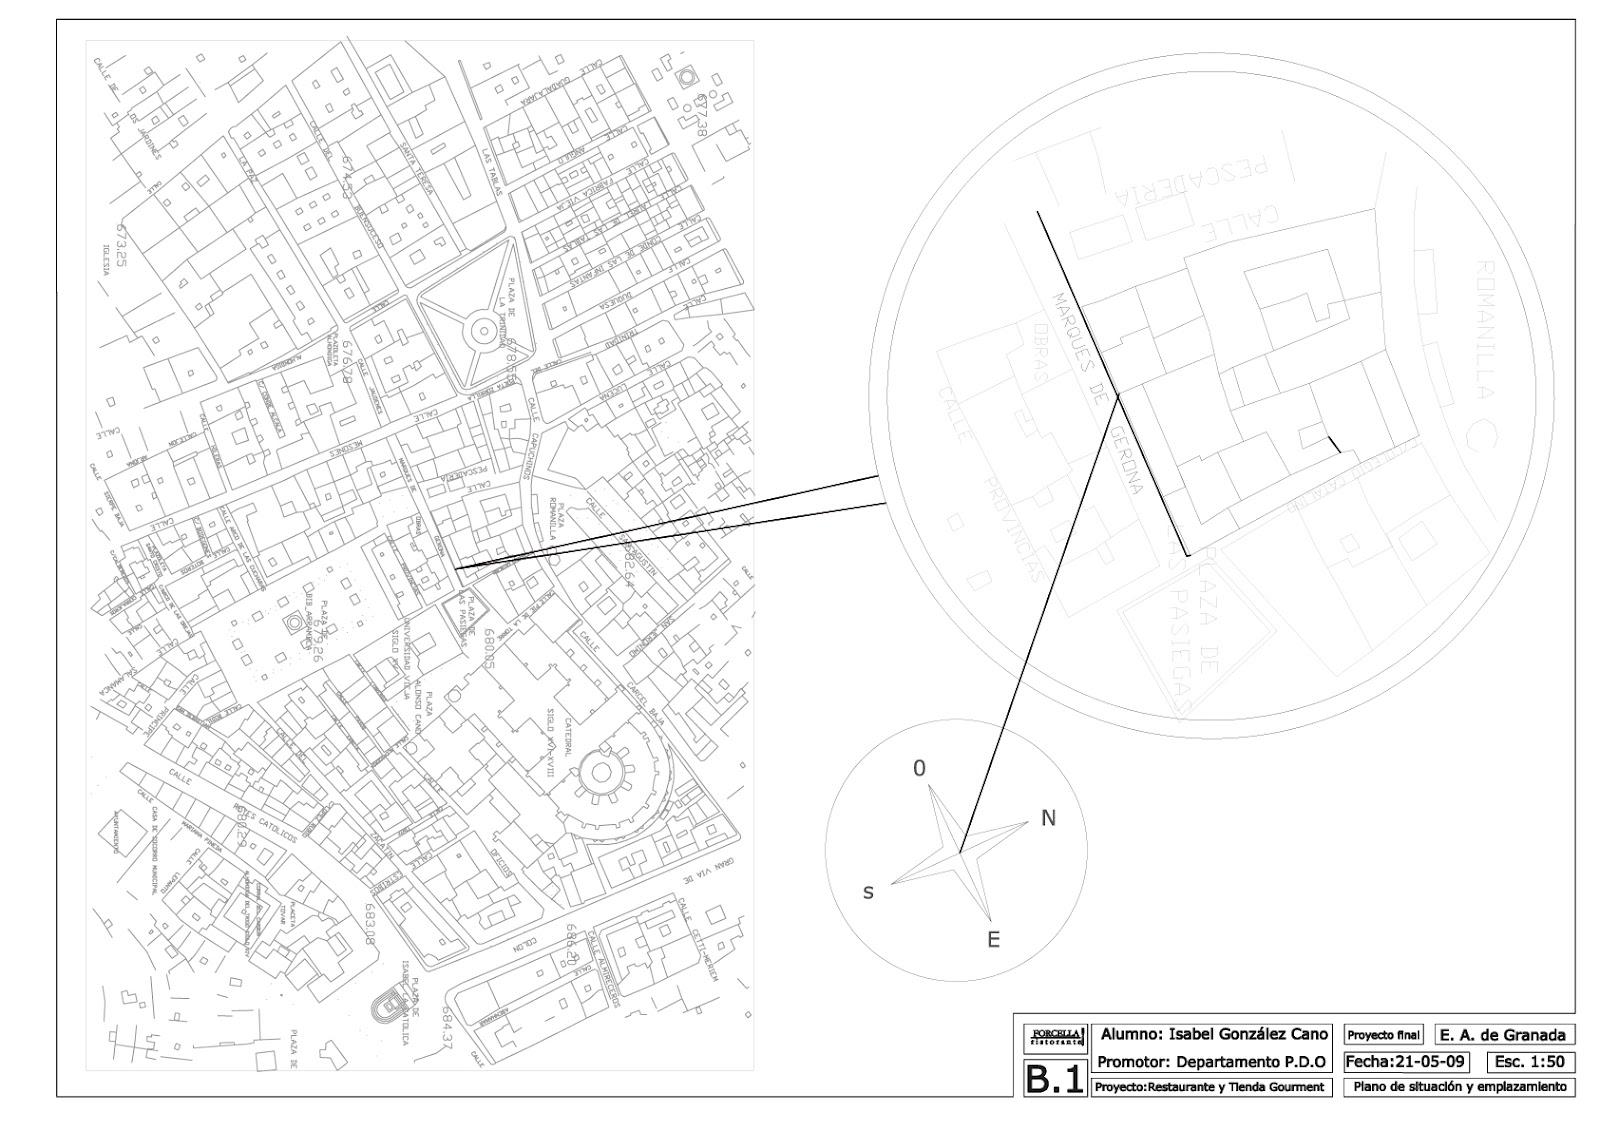 Visi n interiorista proyecto de interiorismo planos for Plano b mobilia